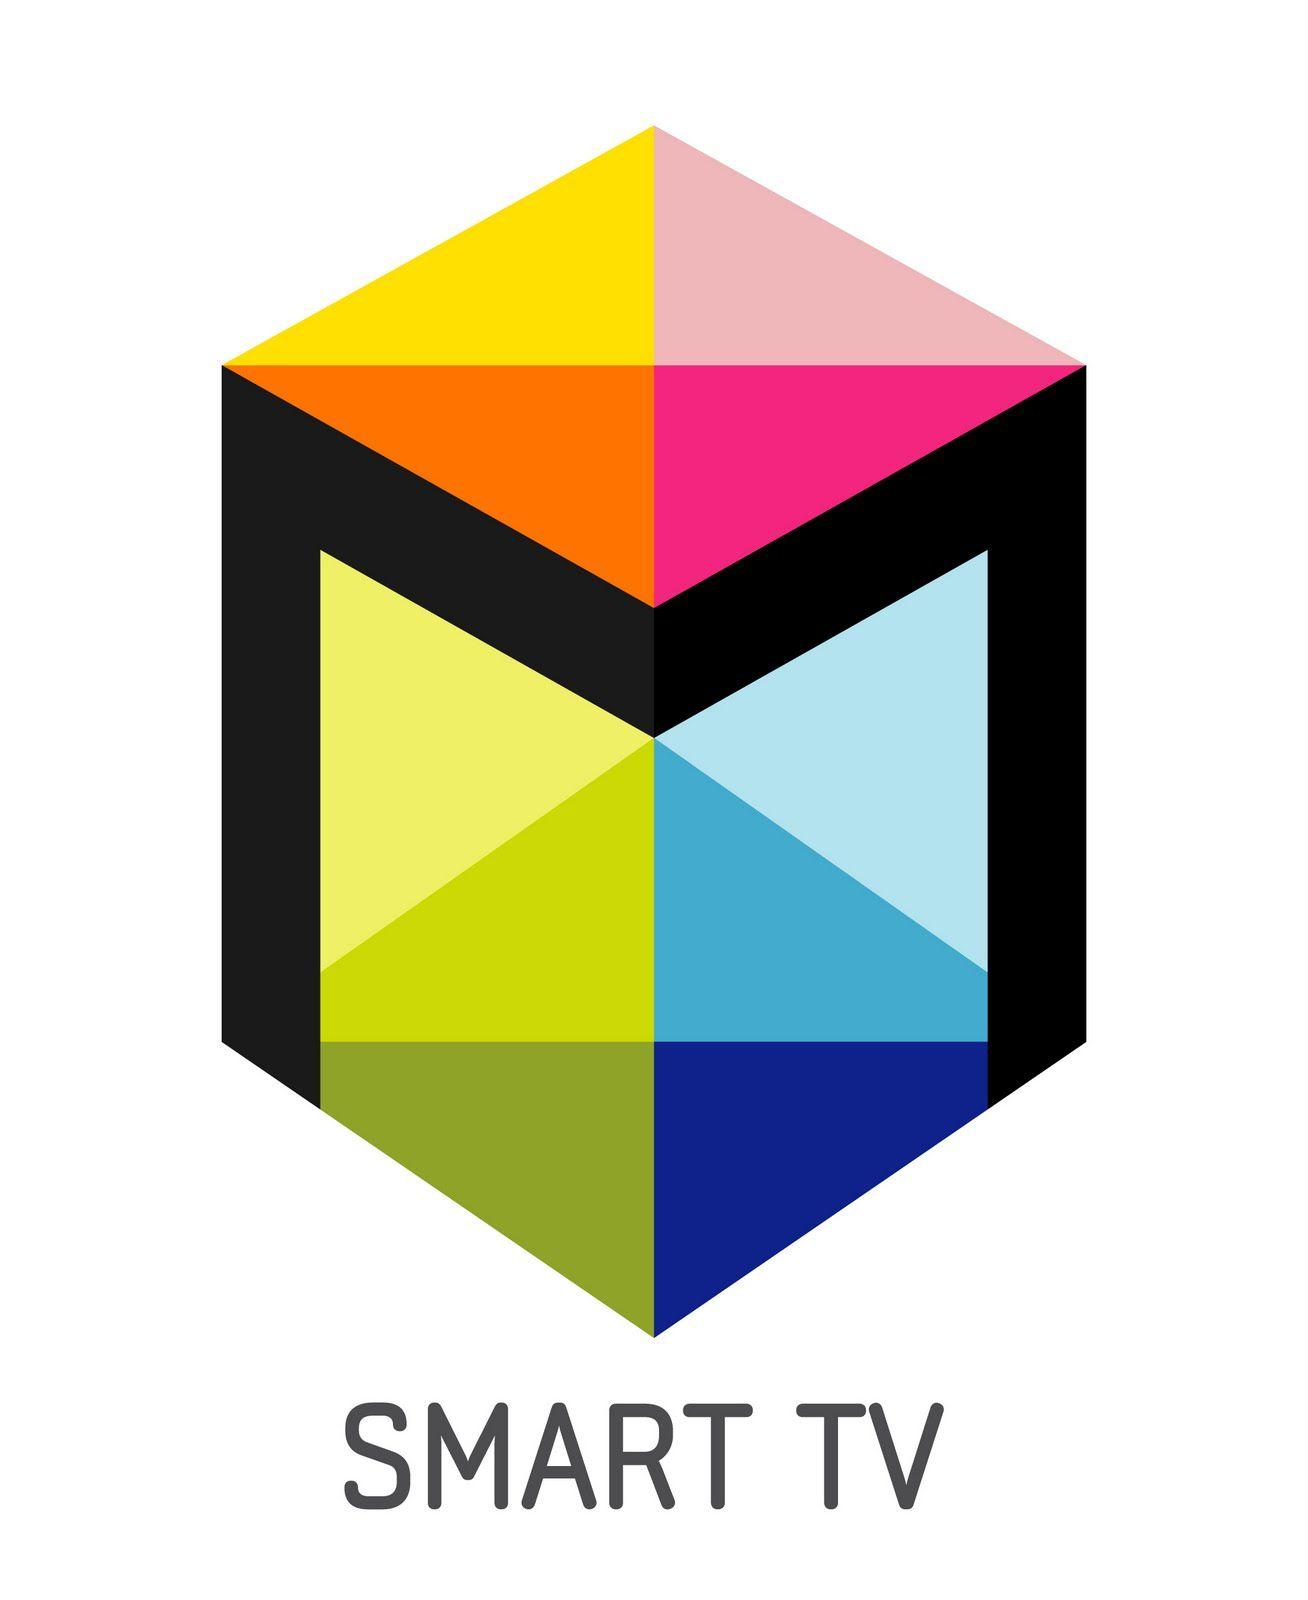 Samsung Smart TV logos Pinterest Smart TV